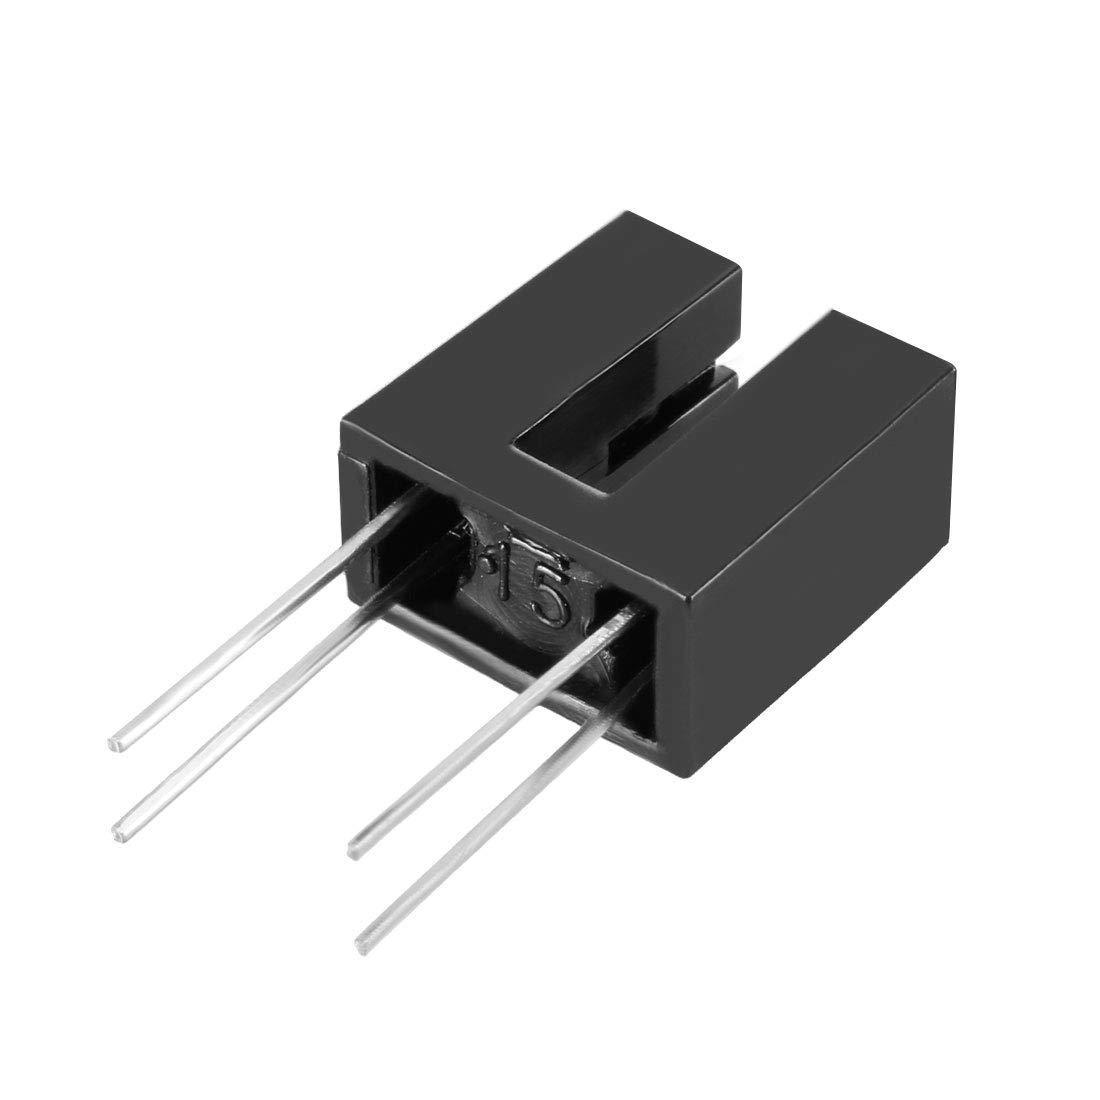 sourcing map 10 Pcs 1//8 Slot PCB Photo Interrupter Slotted Optical Sensor Switch HY860N